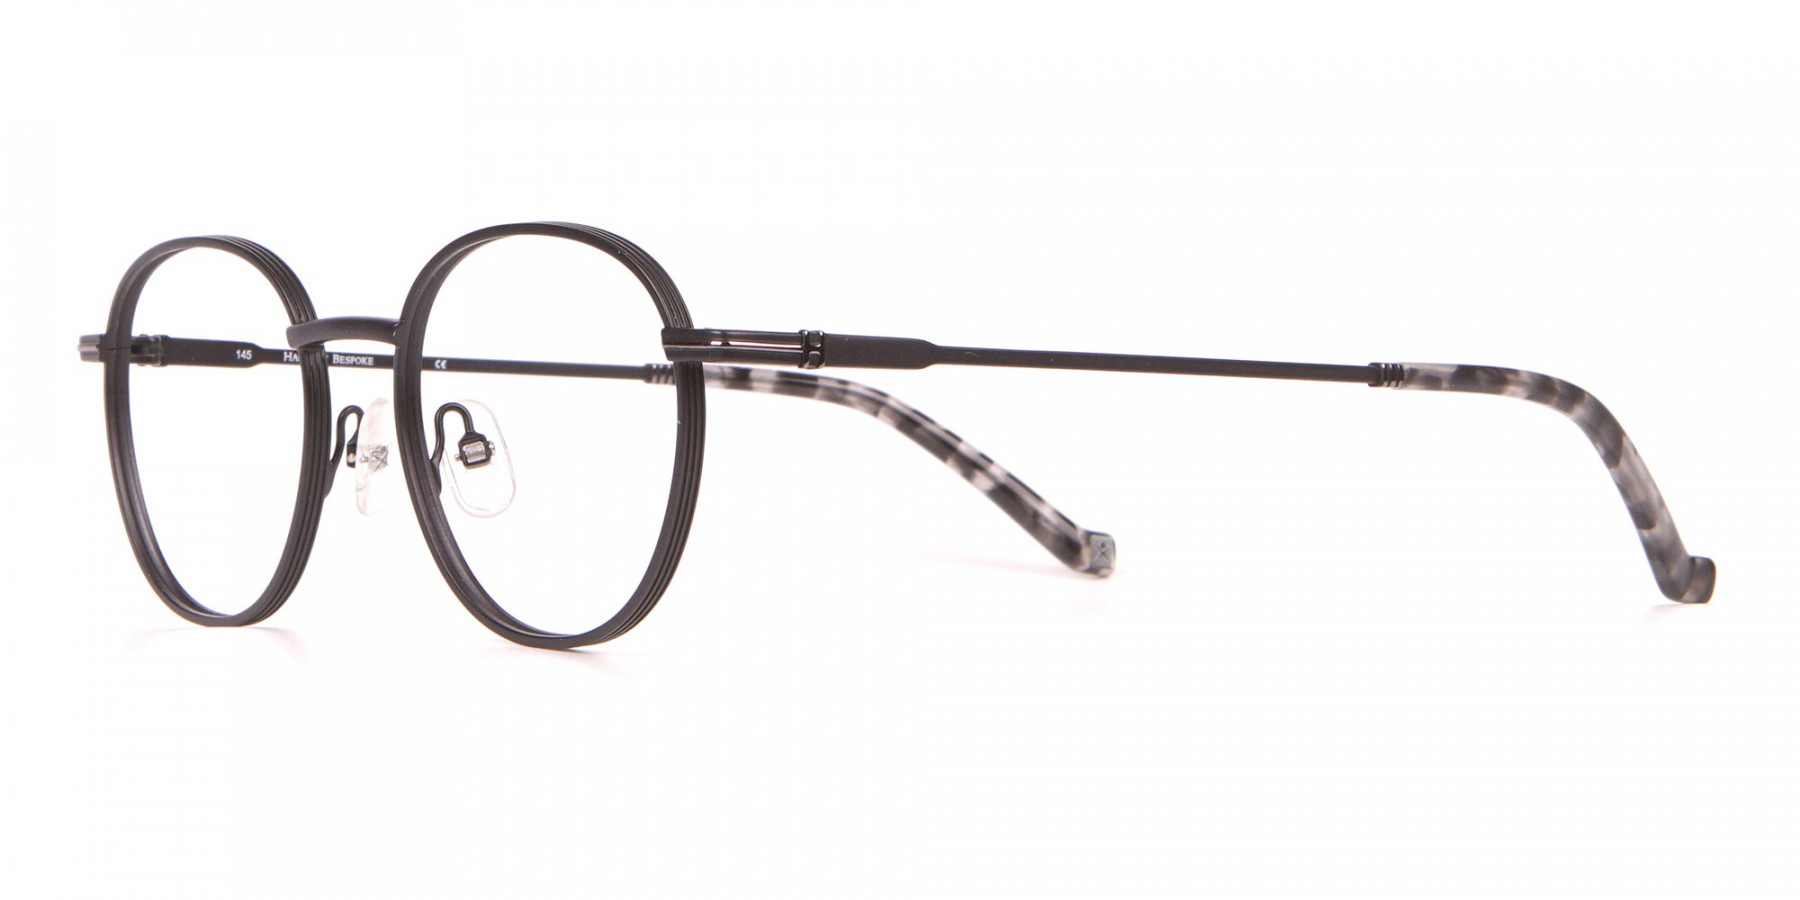 HACKETT HEB222 Bespoke Metal Classic Round Glasses Black-1